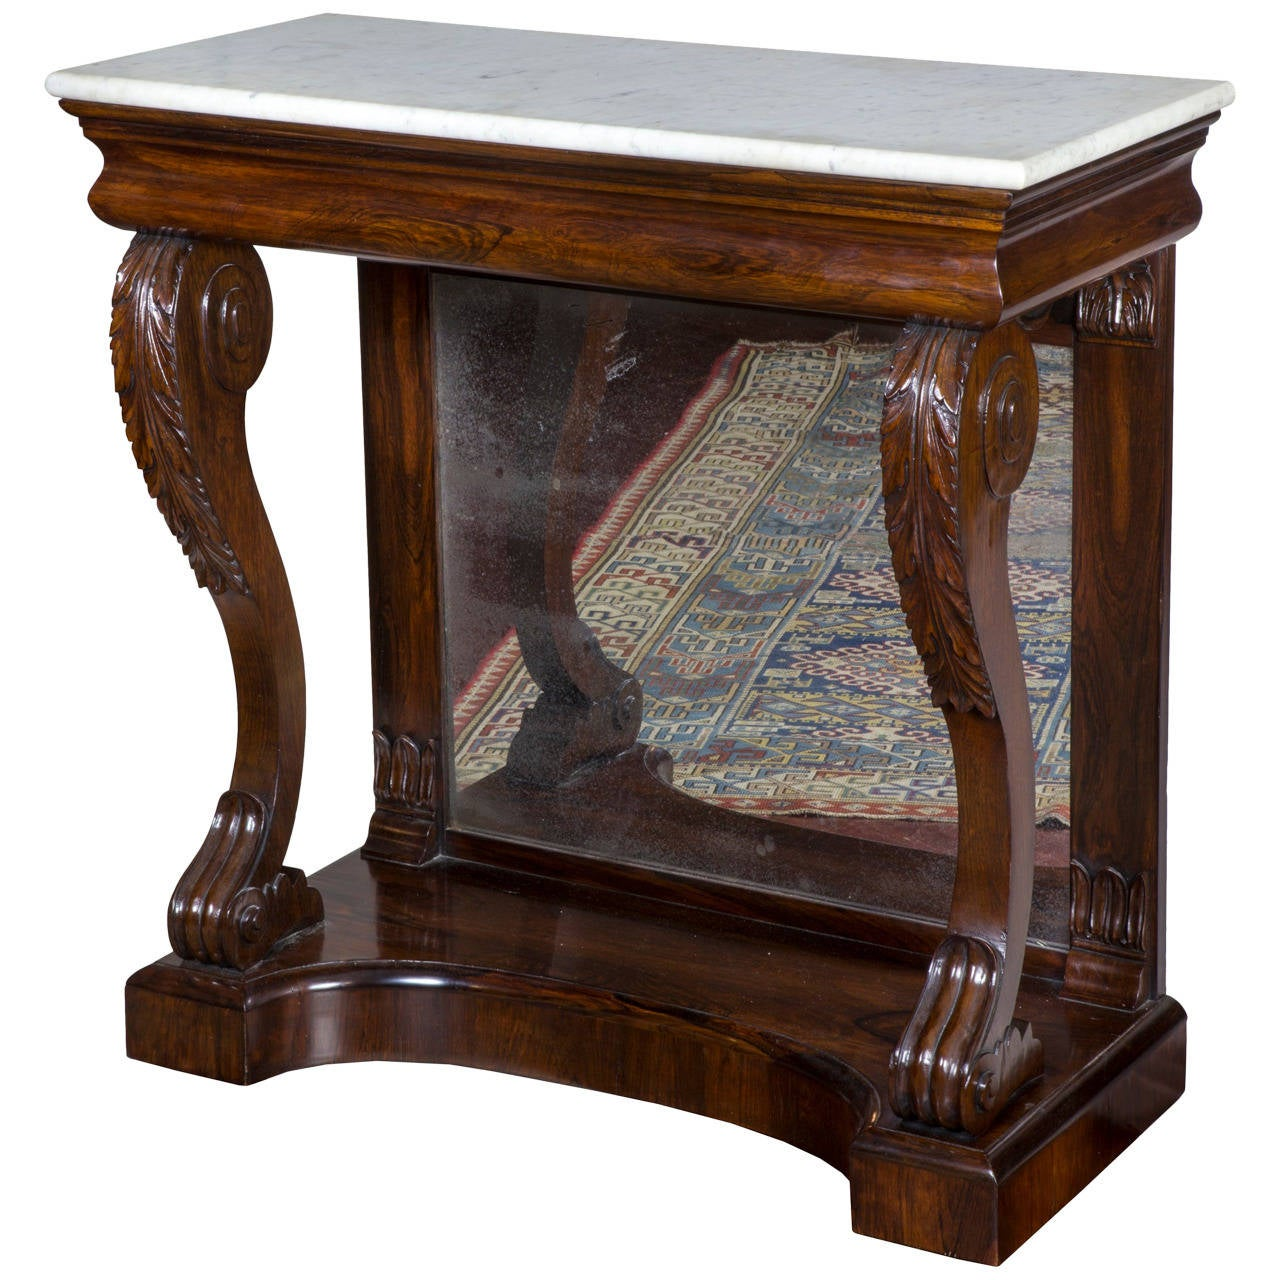 Rosewood Pier Table, Original Marble, Quervelle, Philadelphia, circa 1825